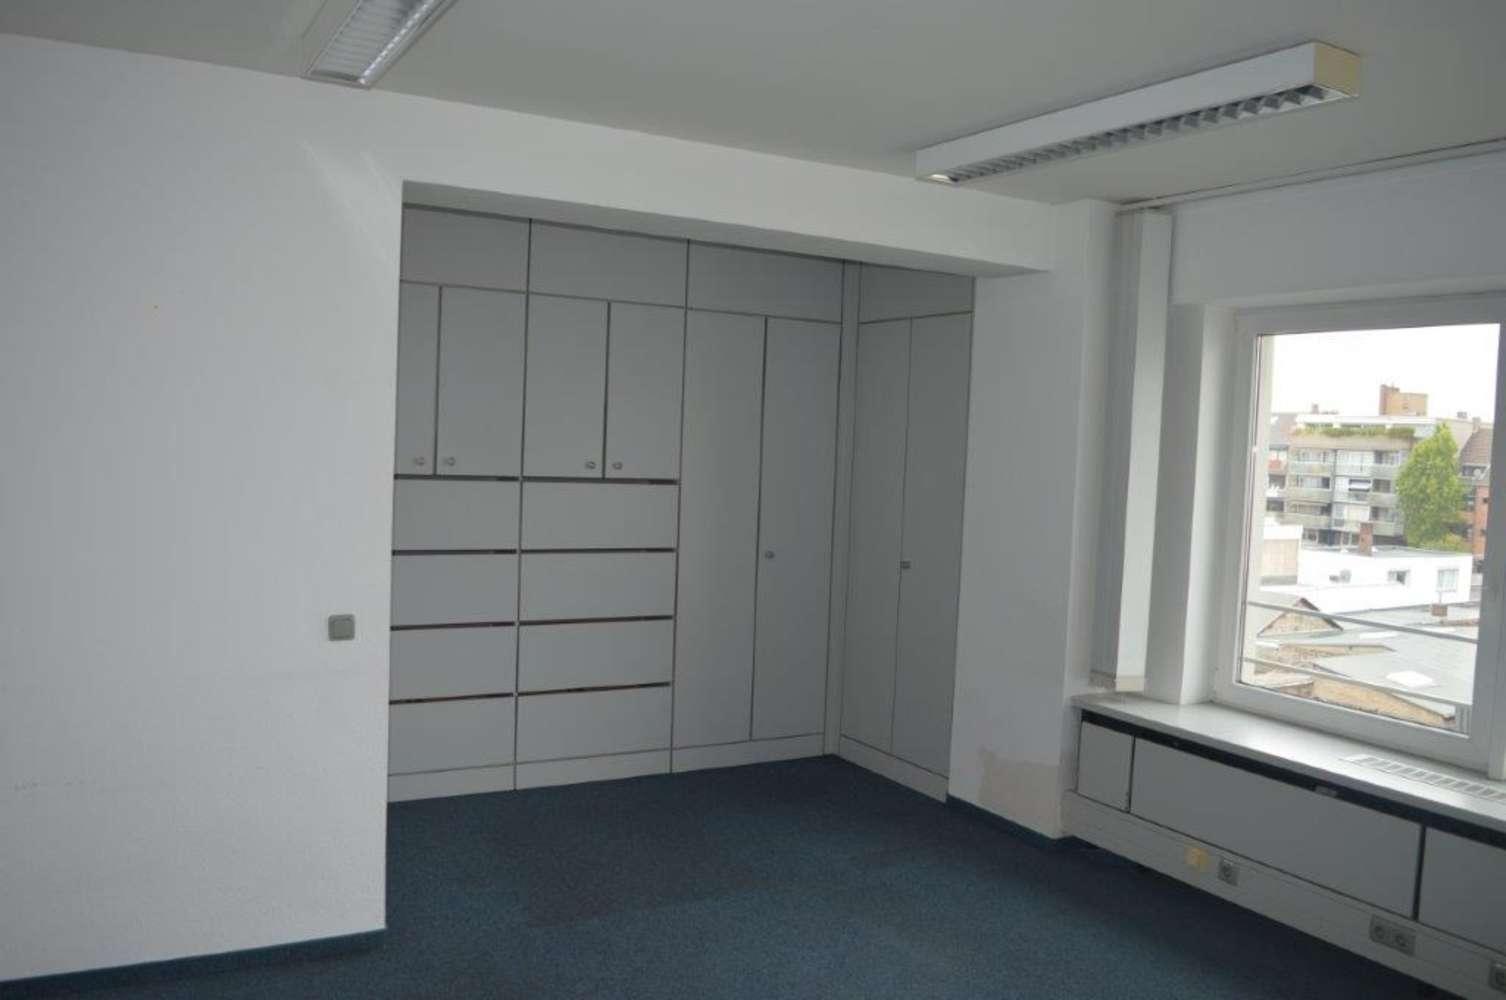 Büros Köln, 50933 - Büro - Köln, Braunsfeld - K1411 - 9762200